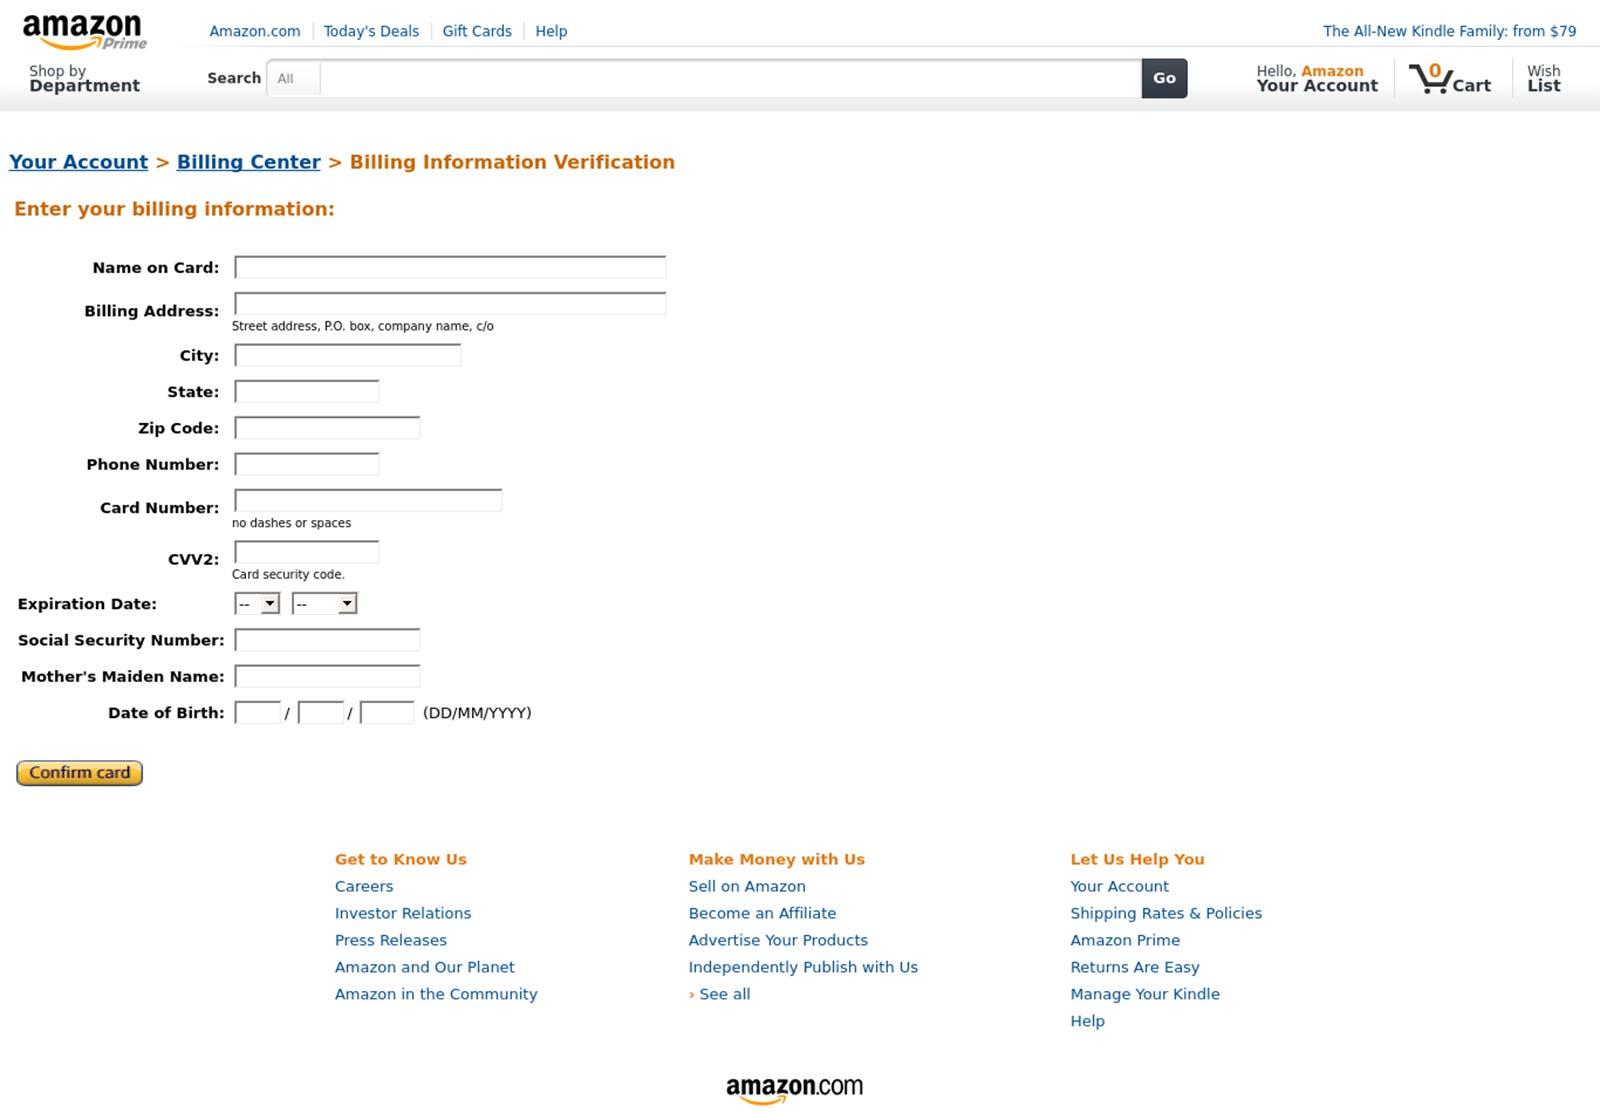 Fake Amazon for phishing